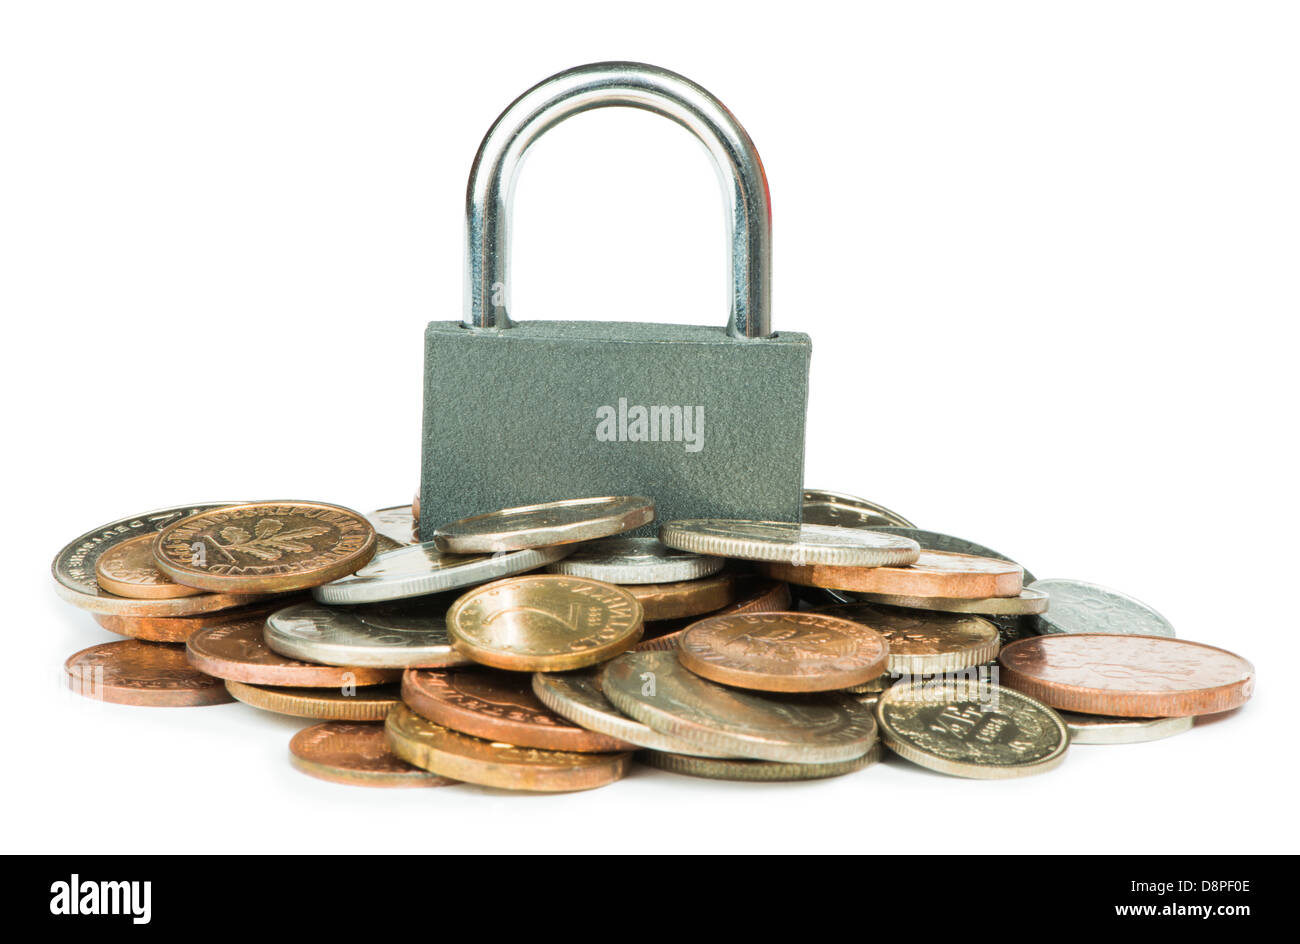 Grey locked padlock and coins. Isolated studio shot. - Stock Image